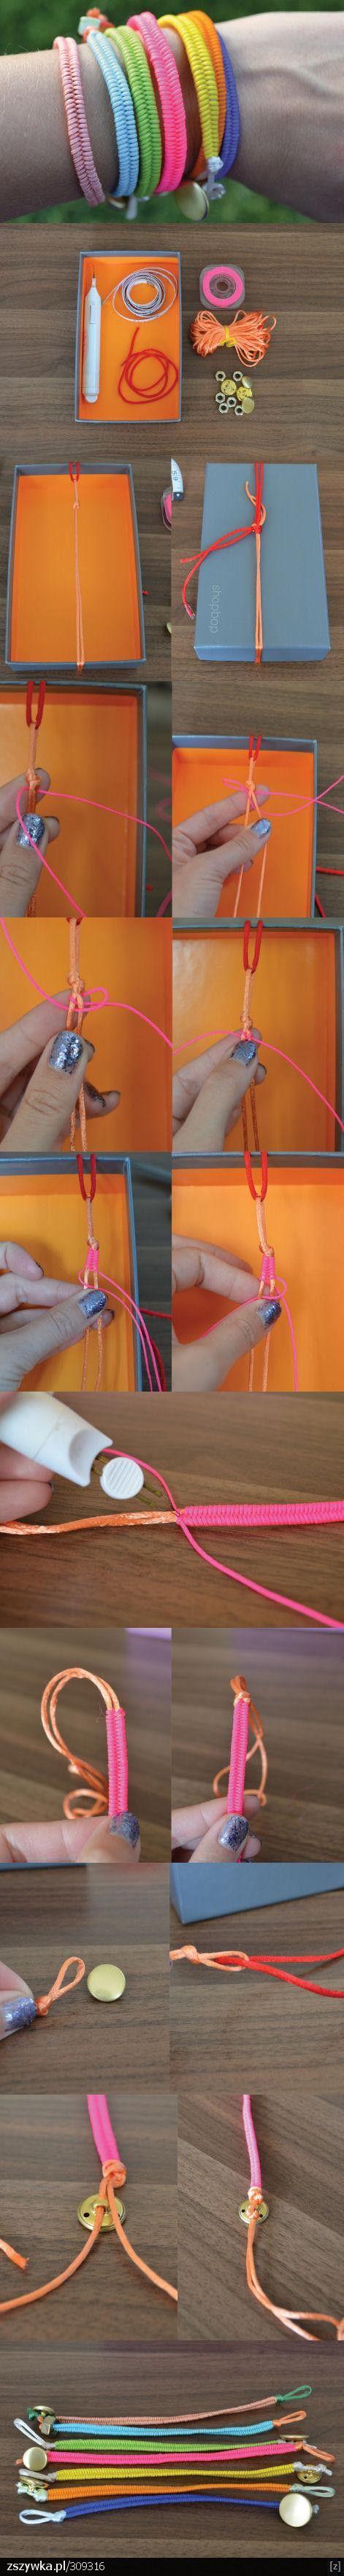 easy to make rainbow bracelets